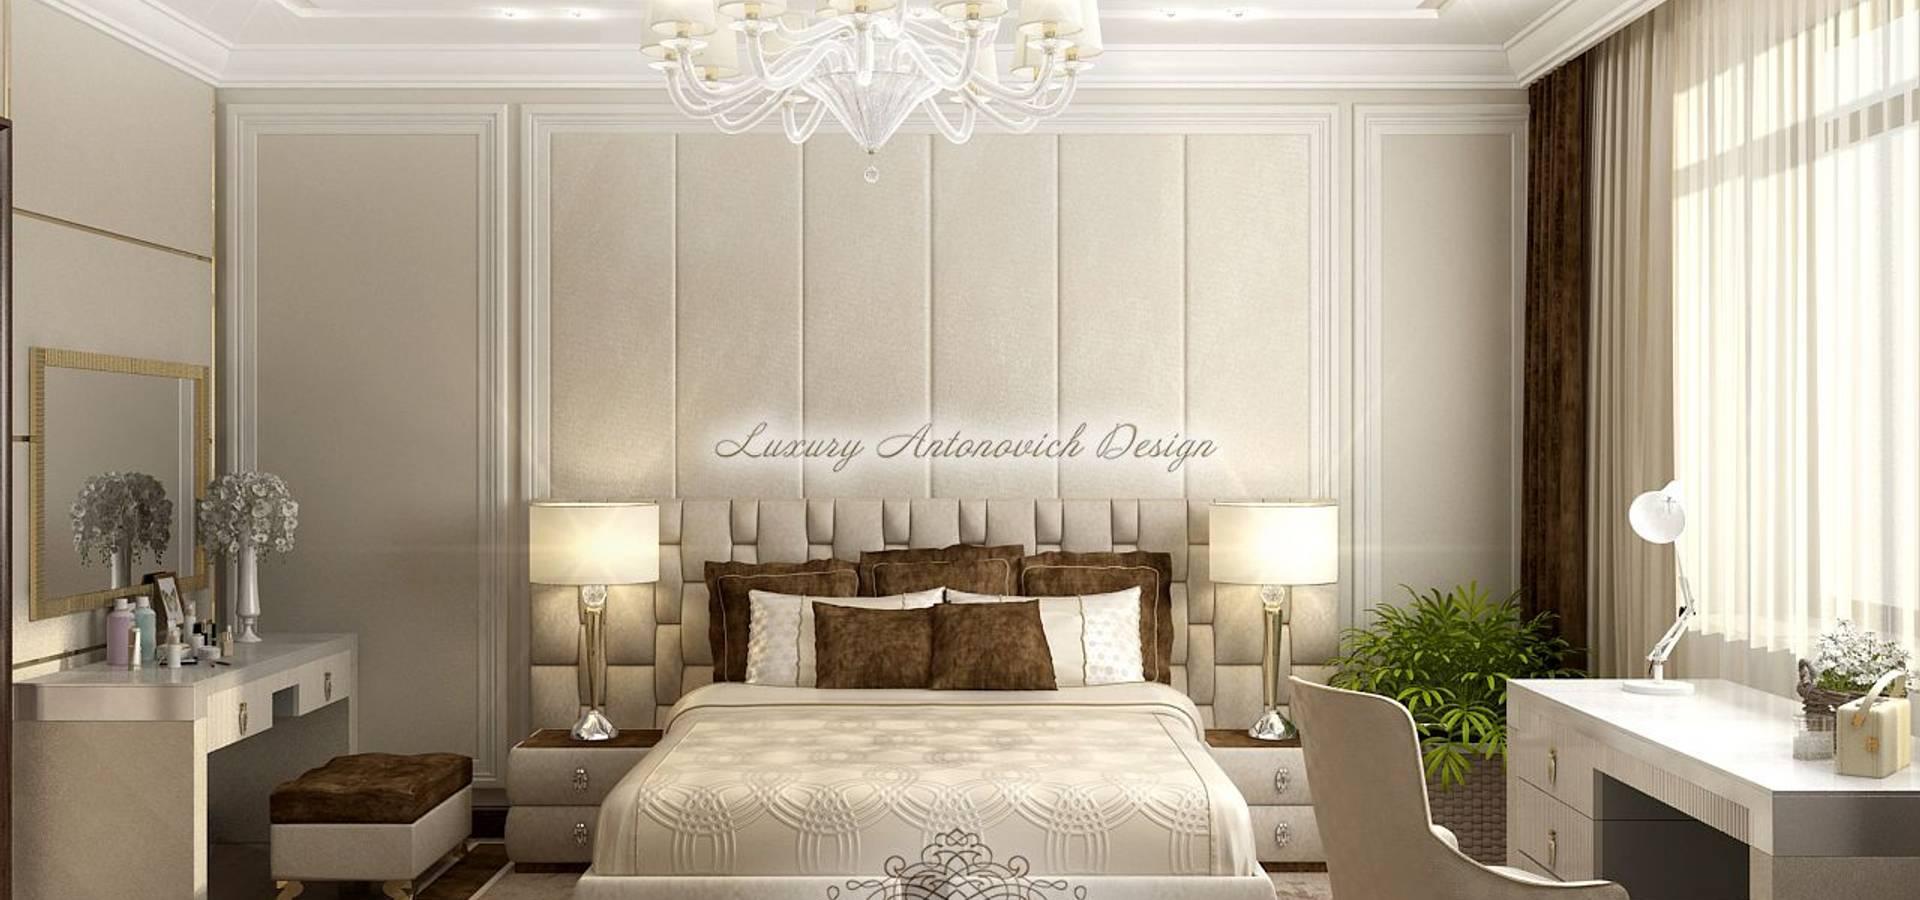 Luxury Antonovich Design Ukraine